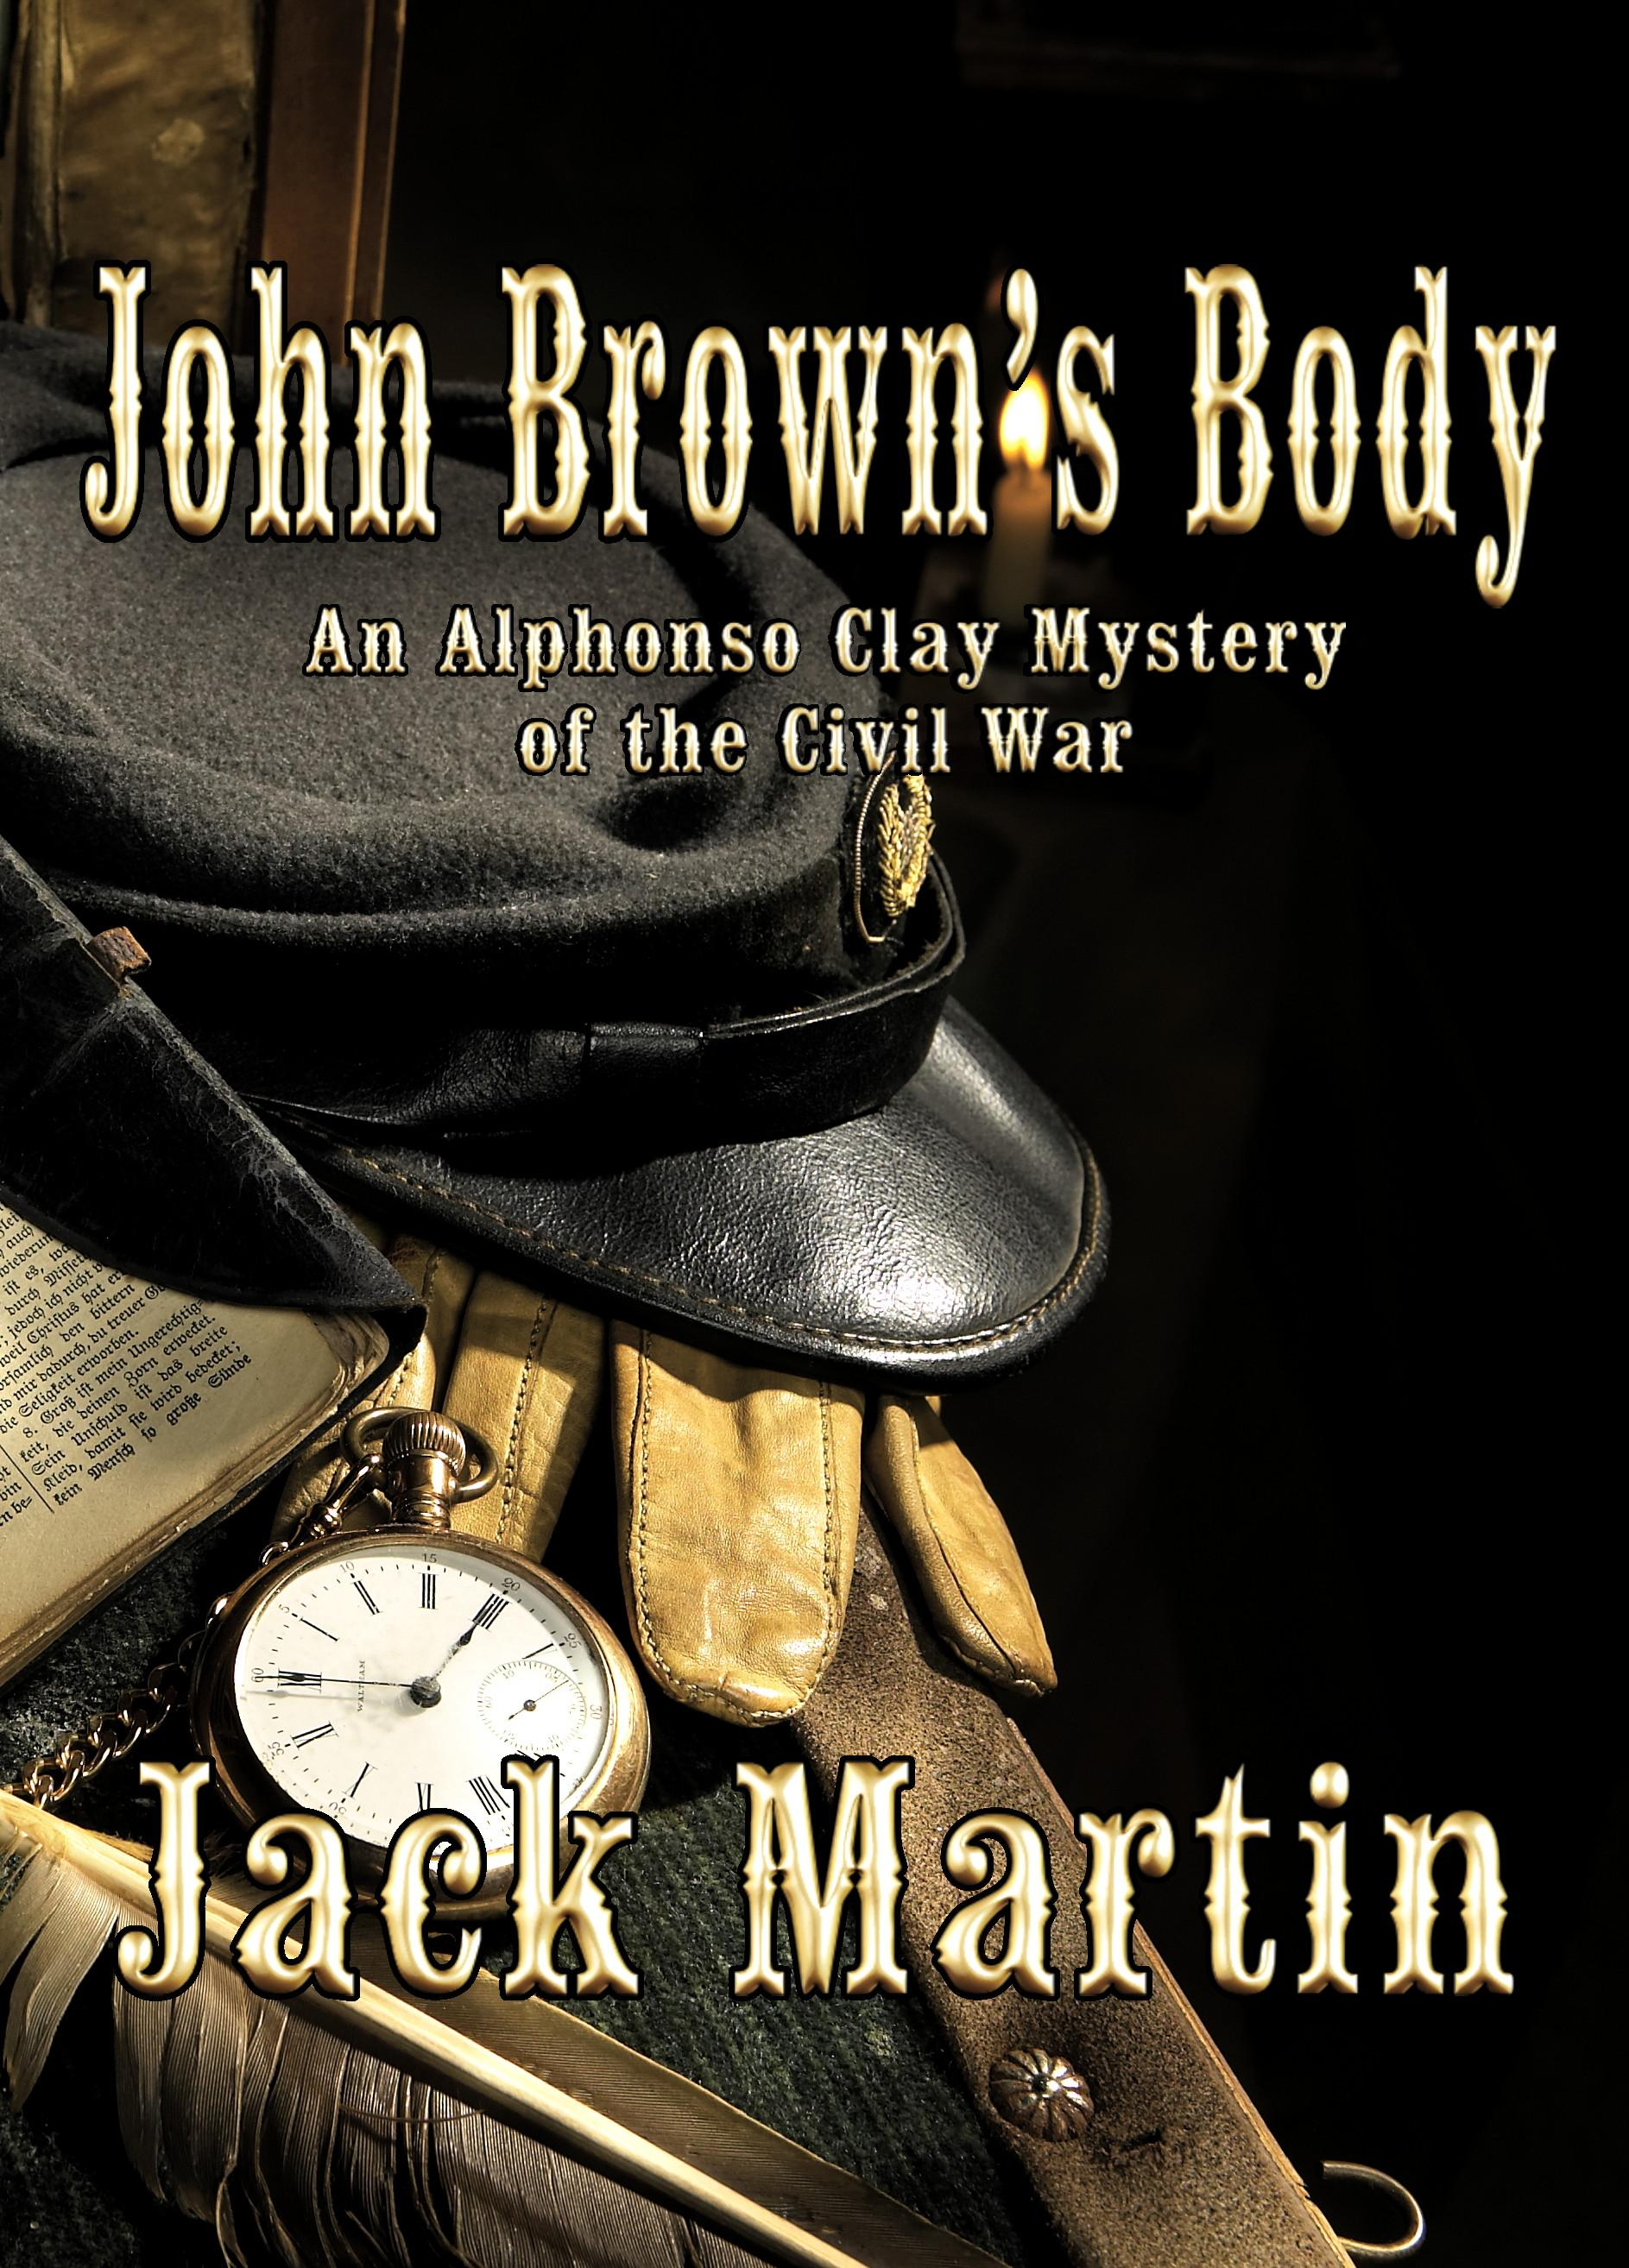 John Brown's Body: An Alphonso Clay Mystery of the Civil War EB9781935585763